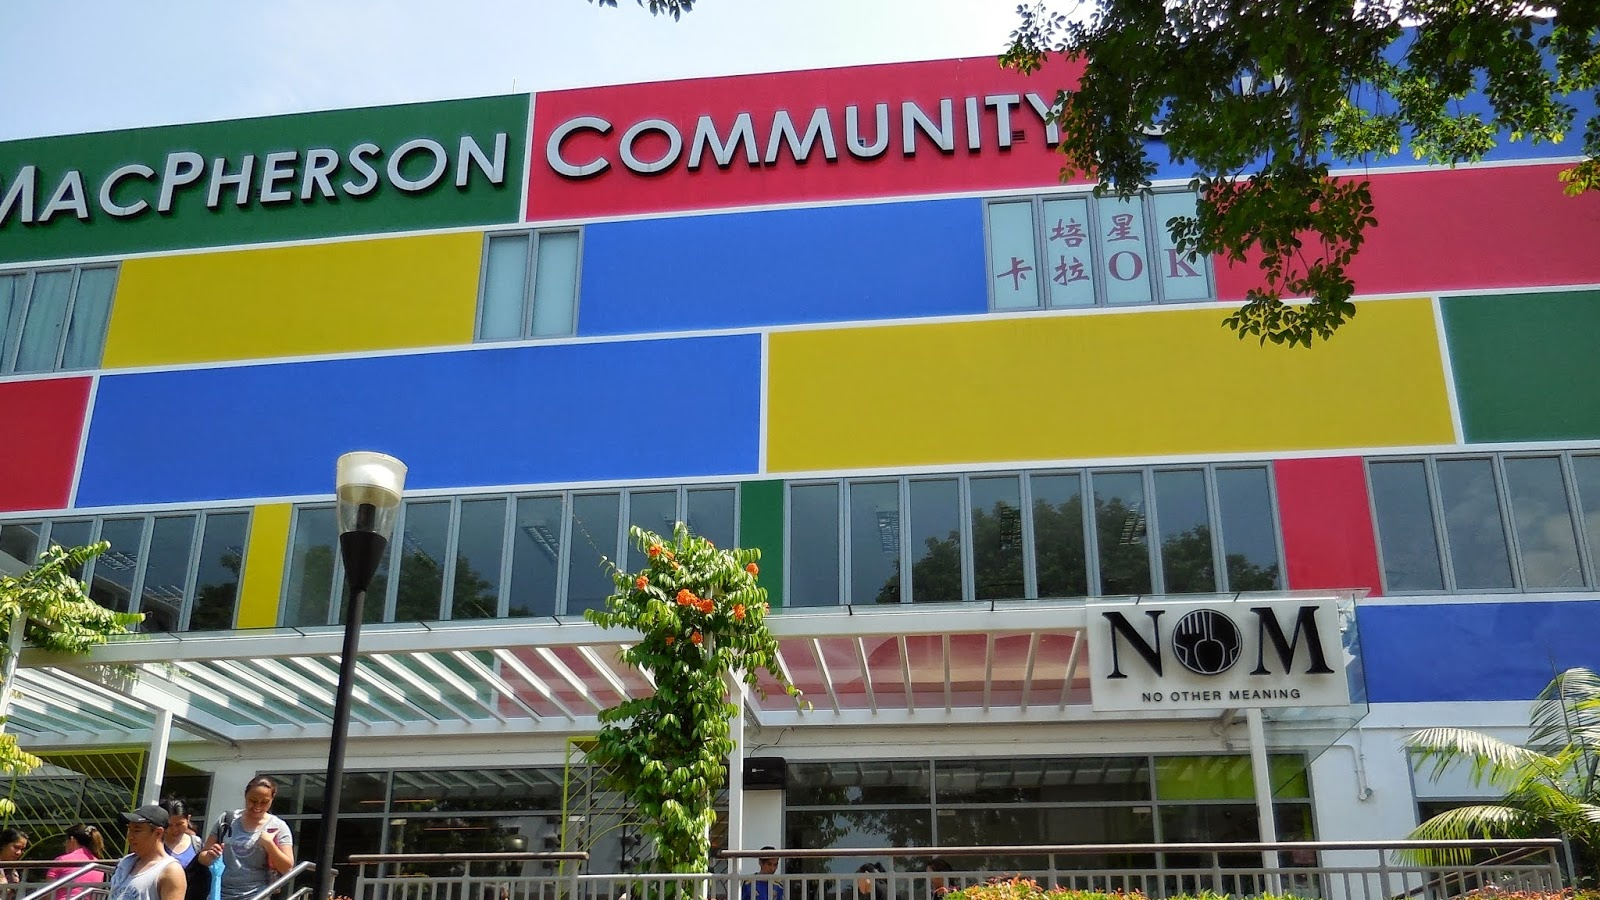 MacPherson Community Club